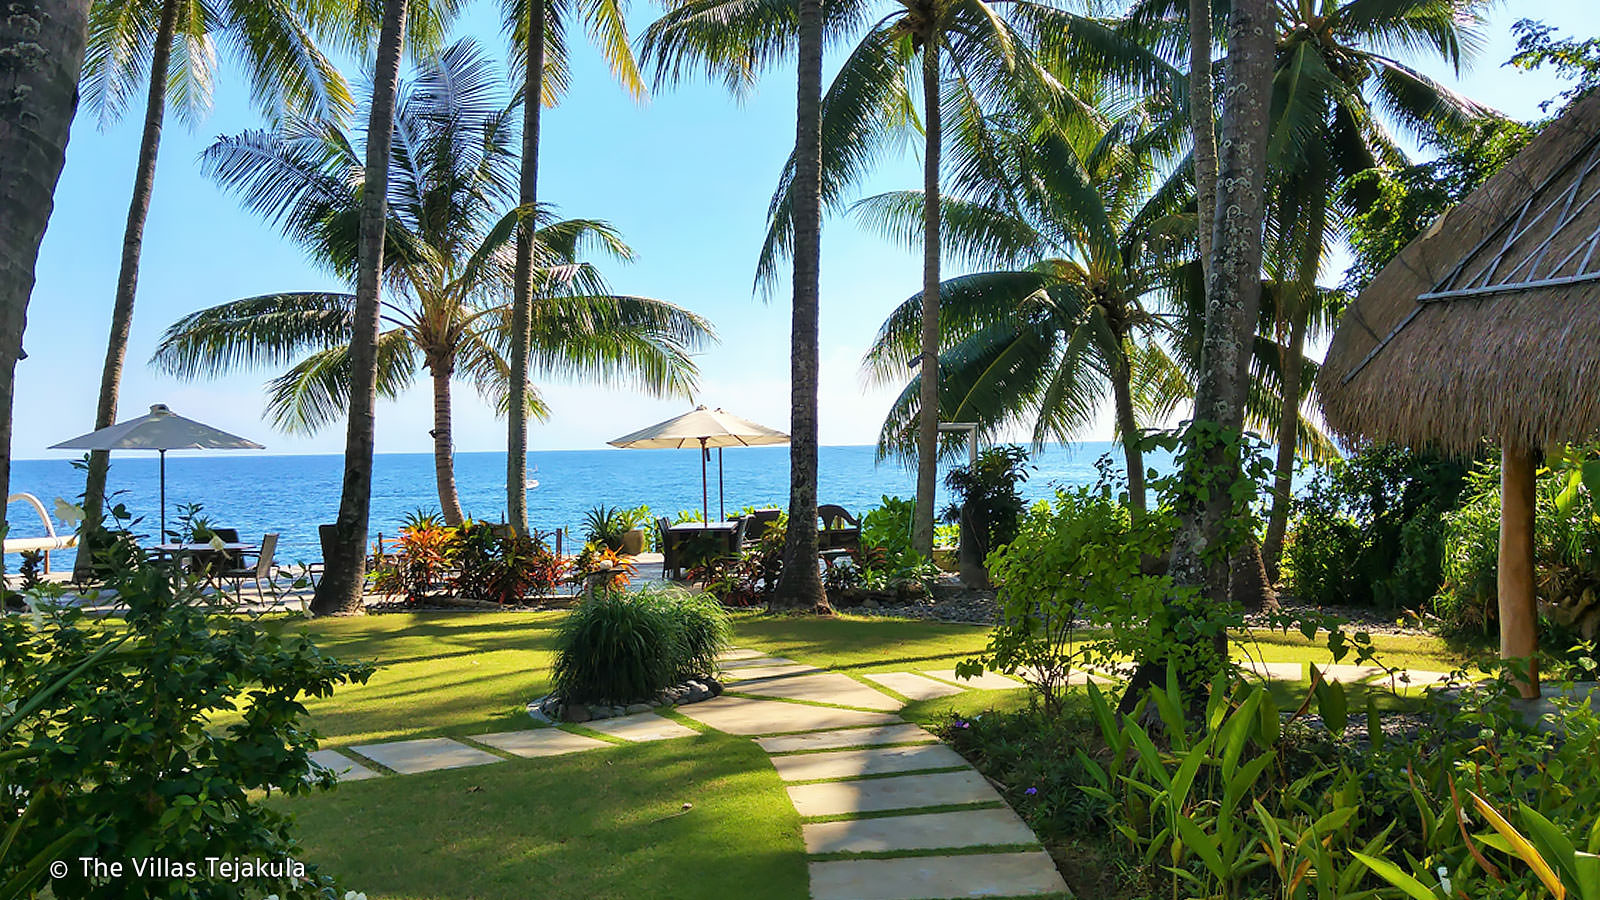 Berbagai Objek Wisata Menarik Di Tejakula Buleleng Bali